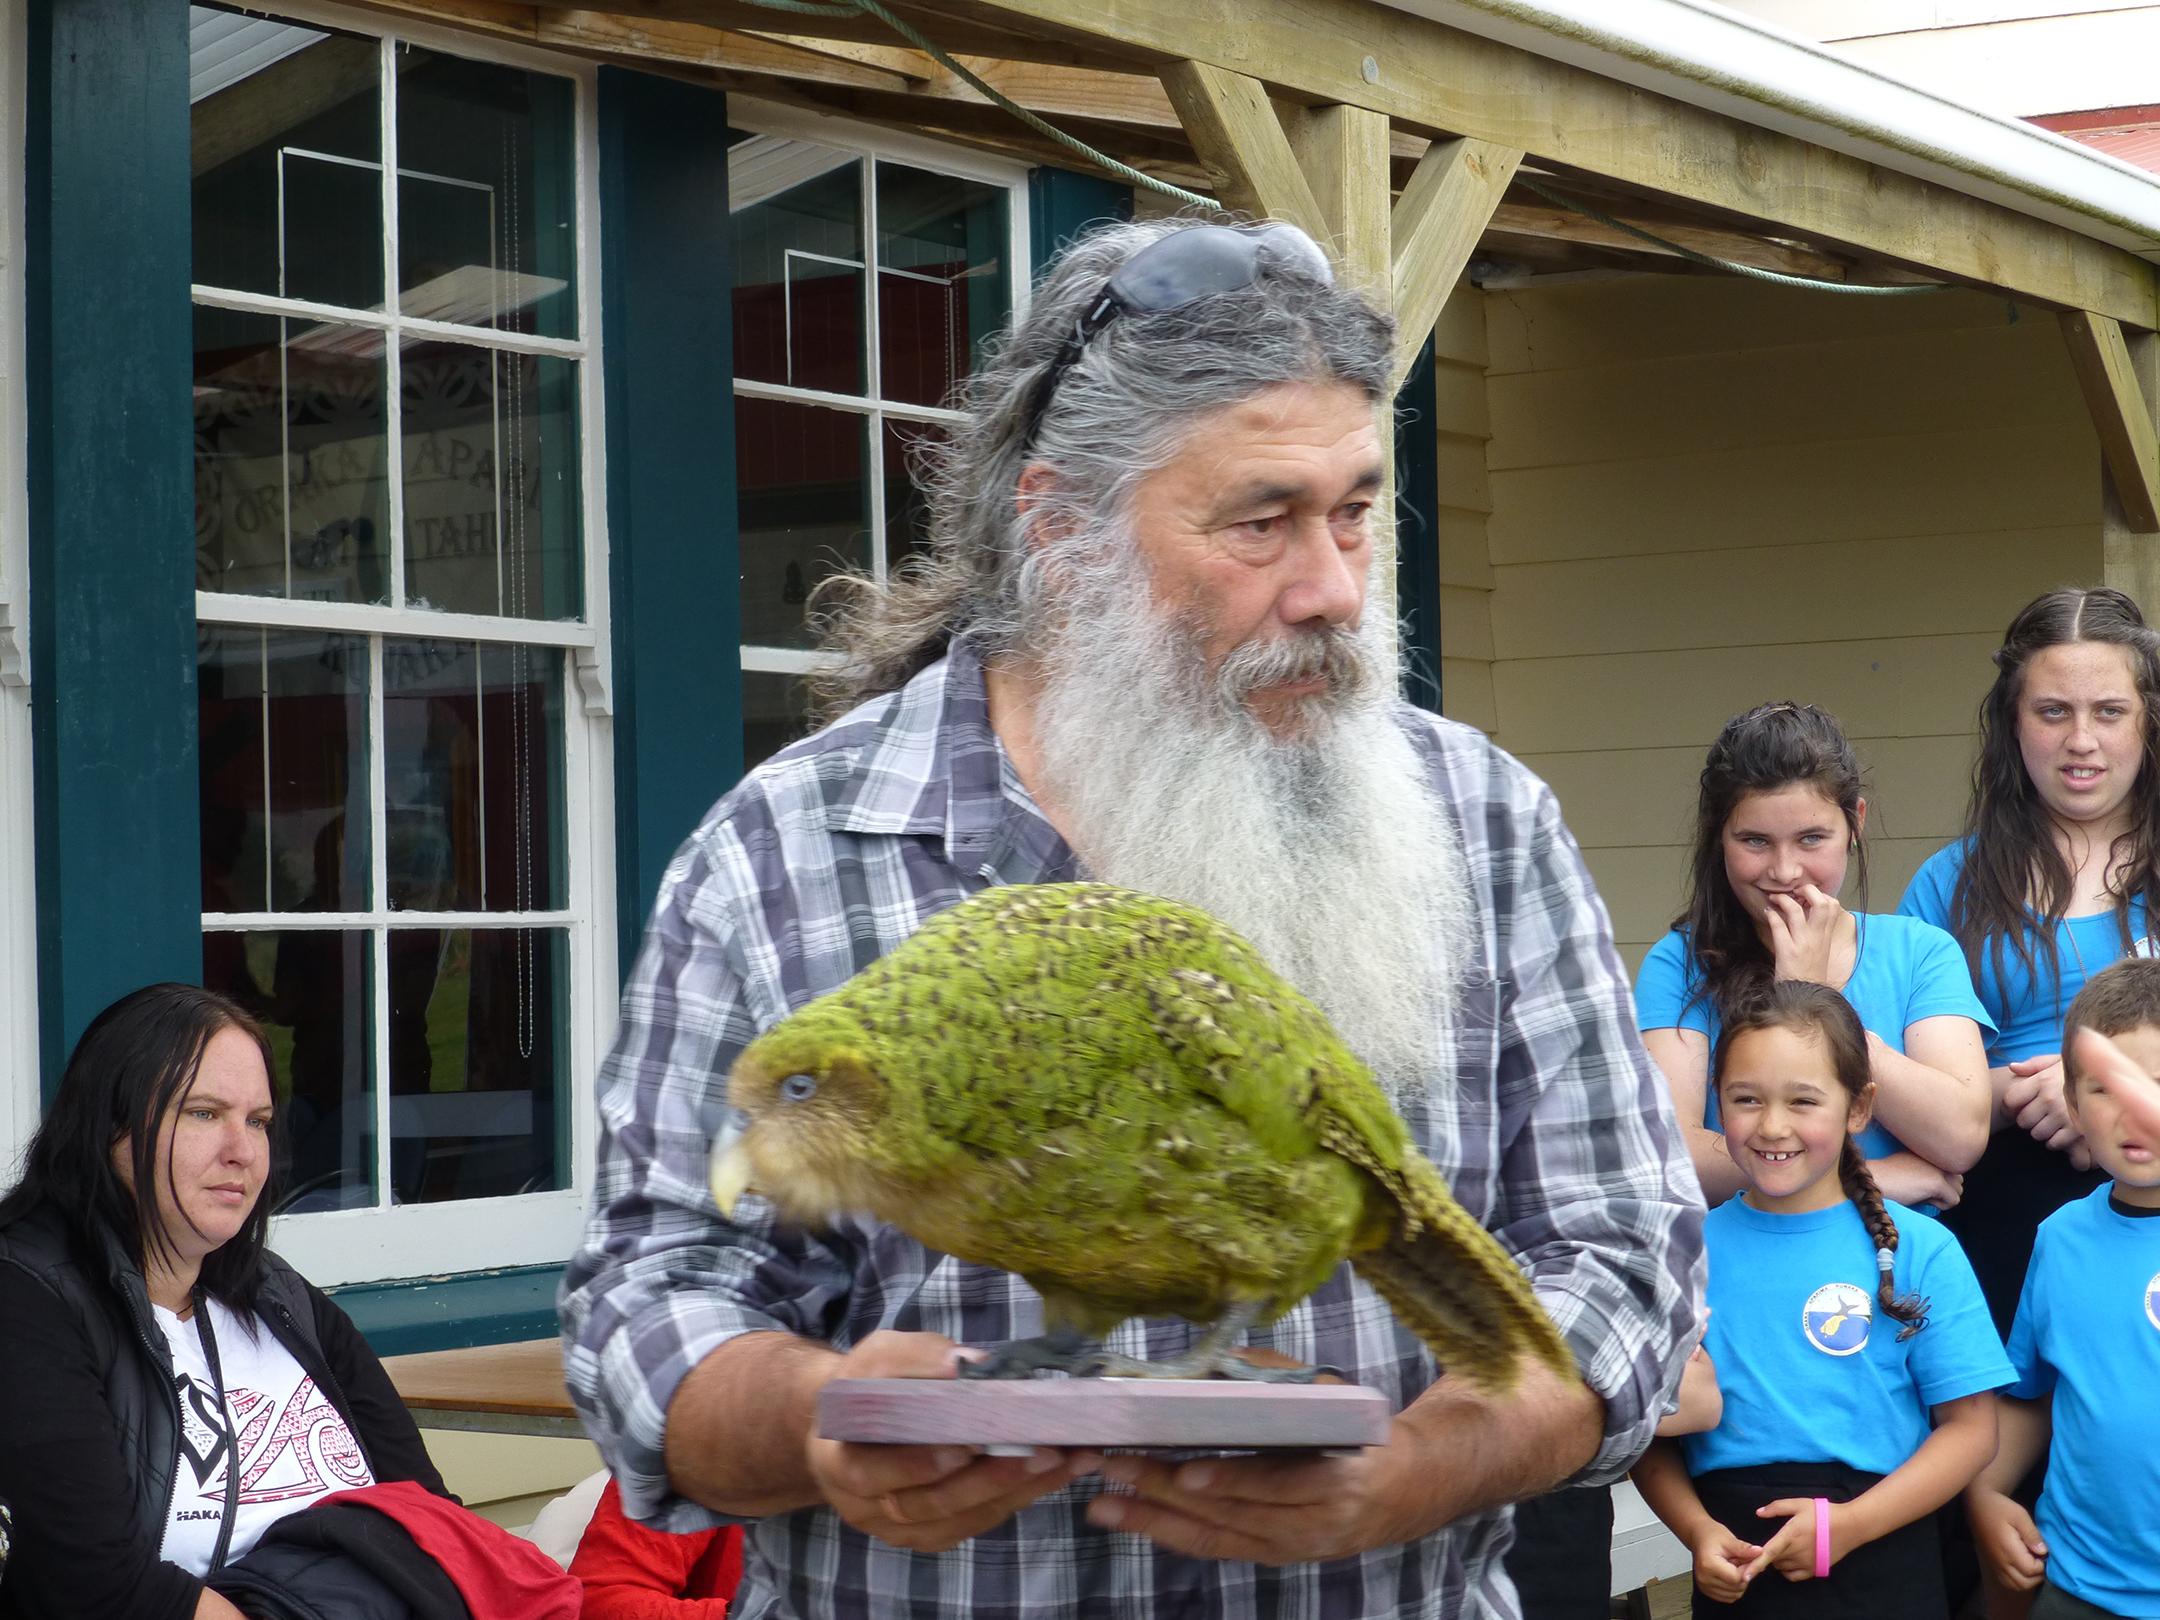 Stewart Bull, chairman of Ōraka-Aparima Rūnaka, posing with a kākāpō presented to the Rūnaka by the Department of Conservation.